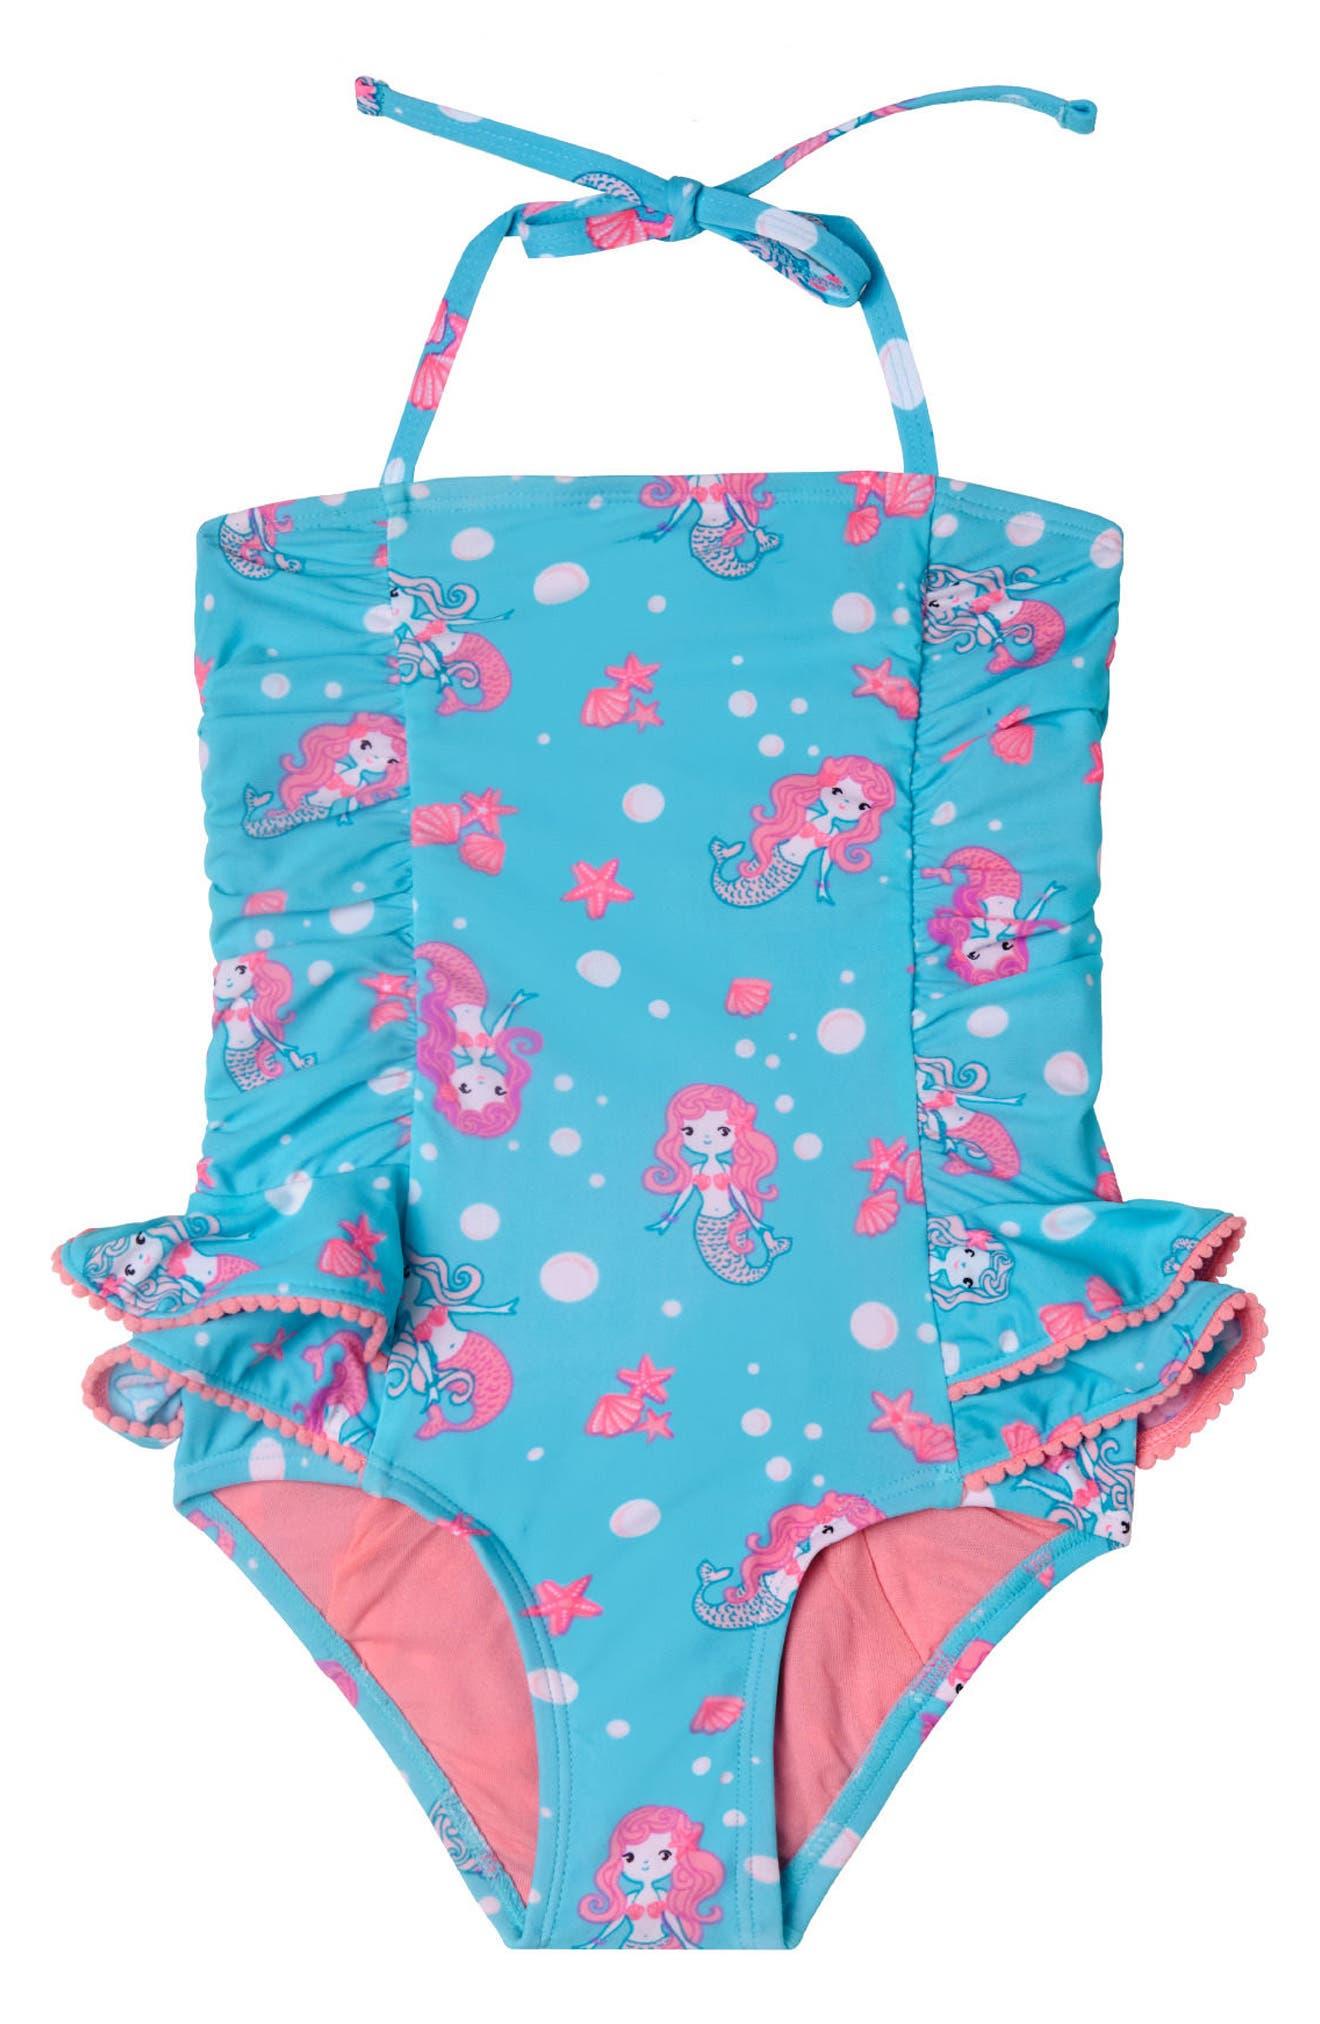 Mermaid Crush One-Piece Swimsuit,                             Main thumbnail 1, color,                             405